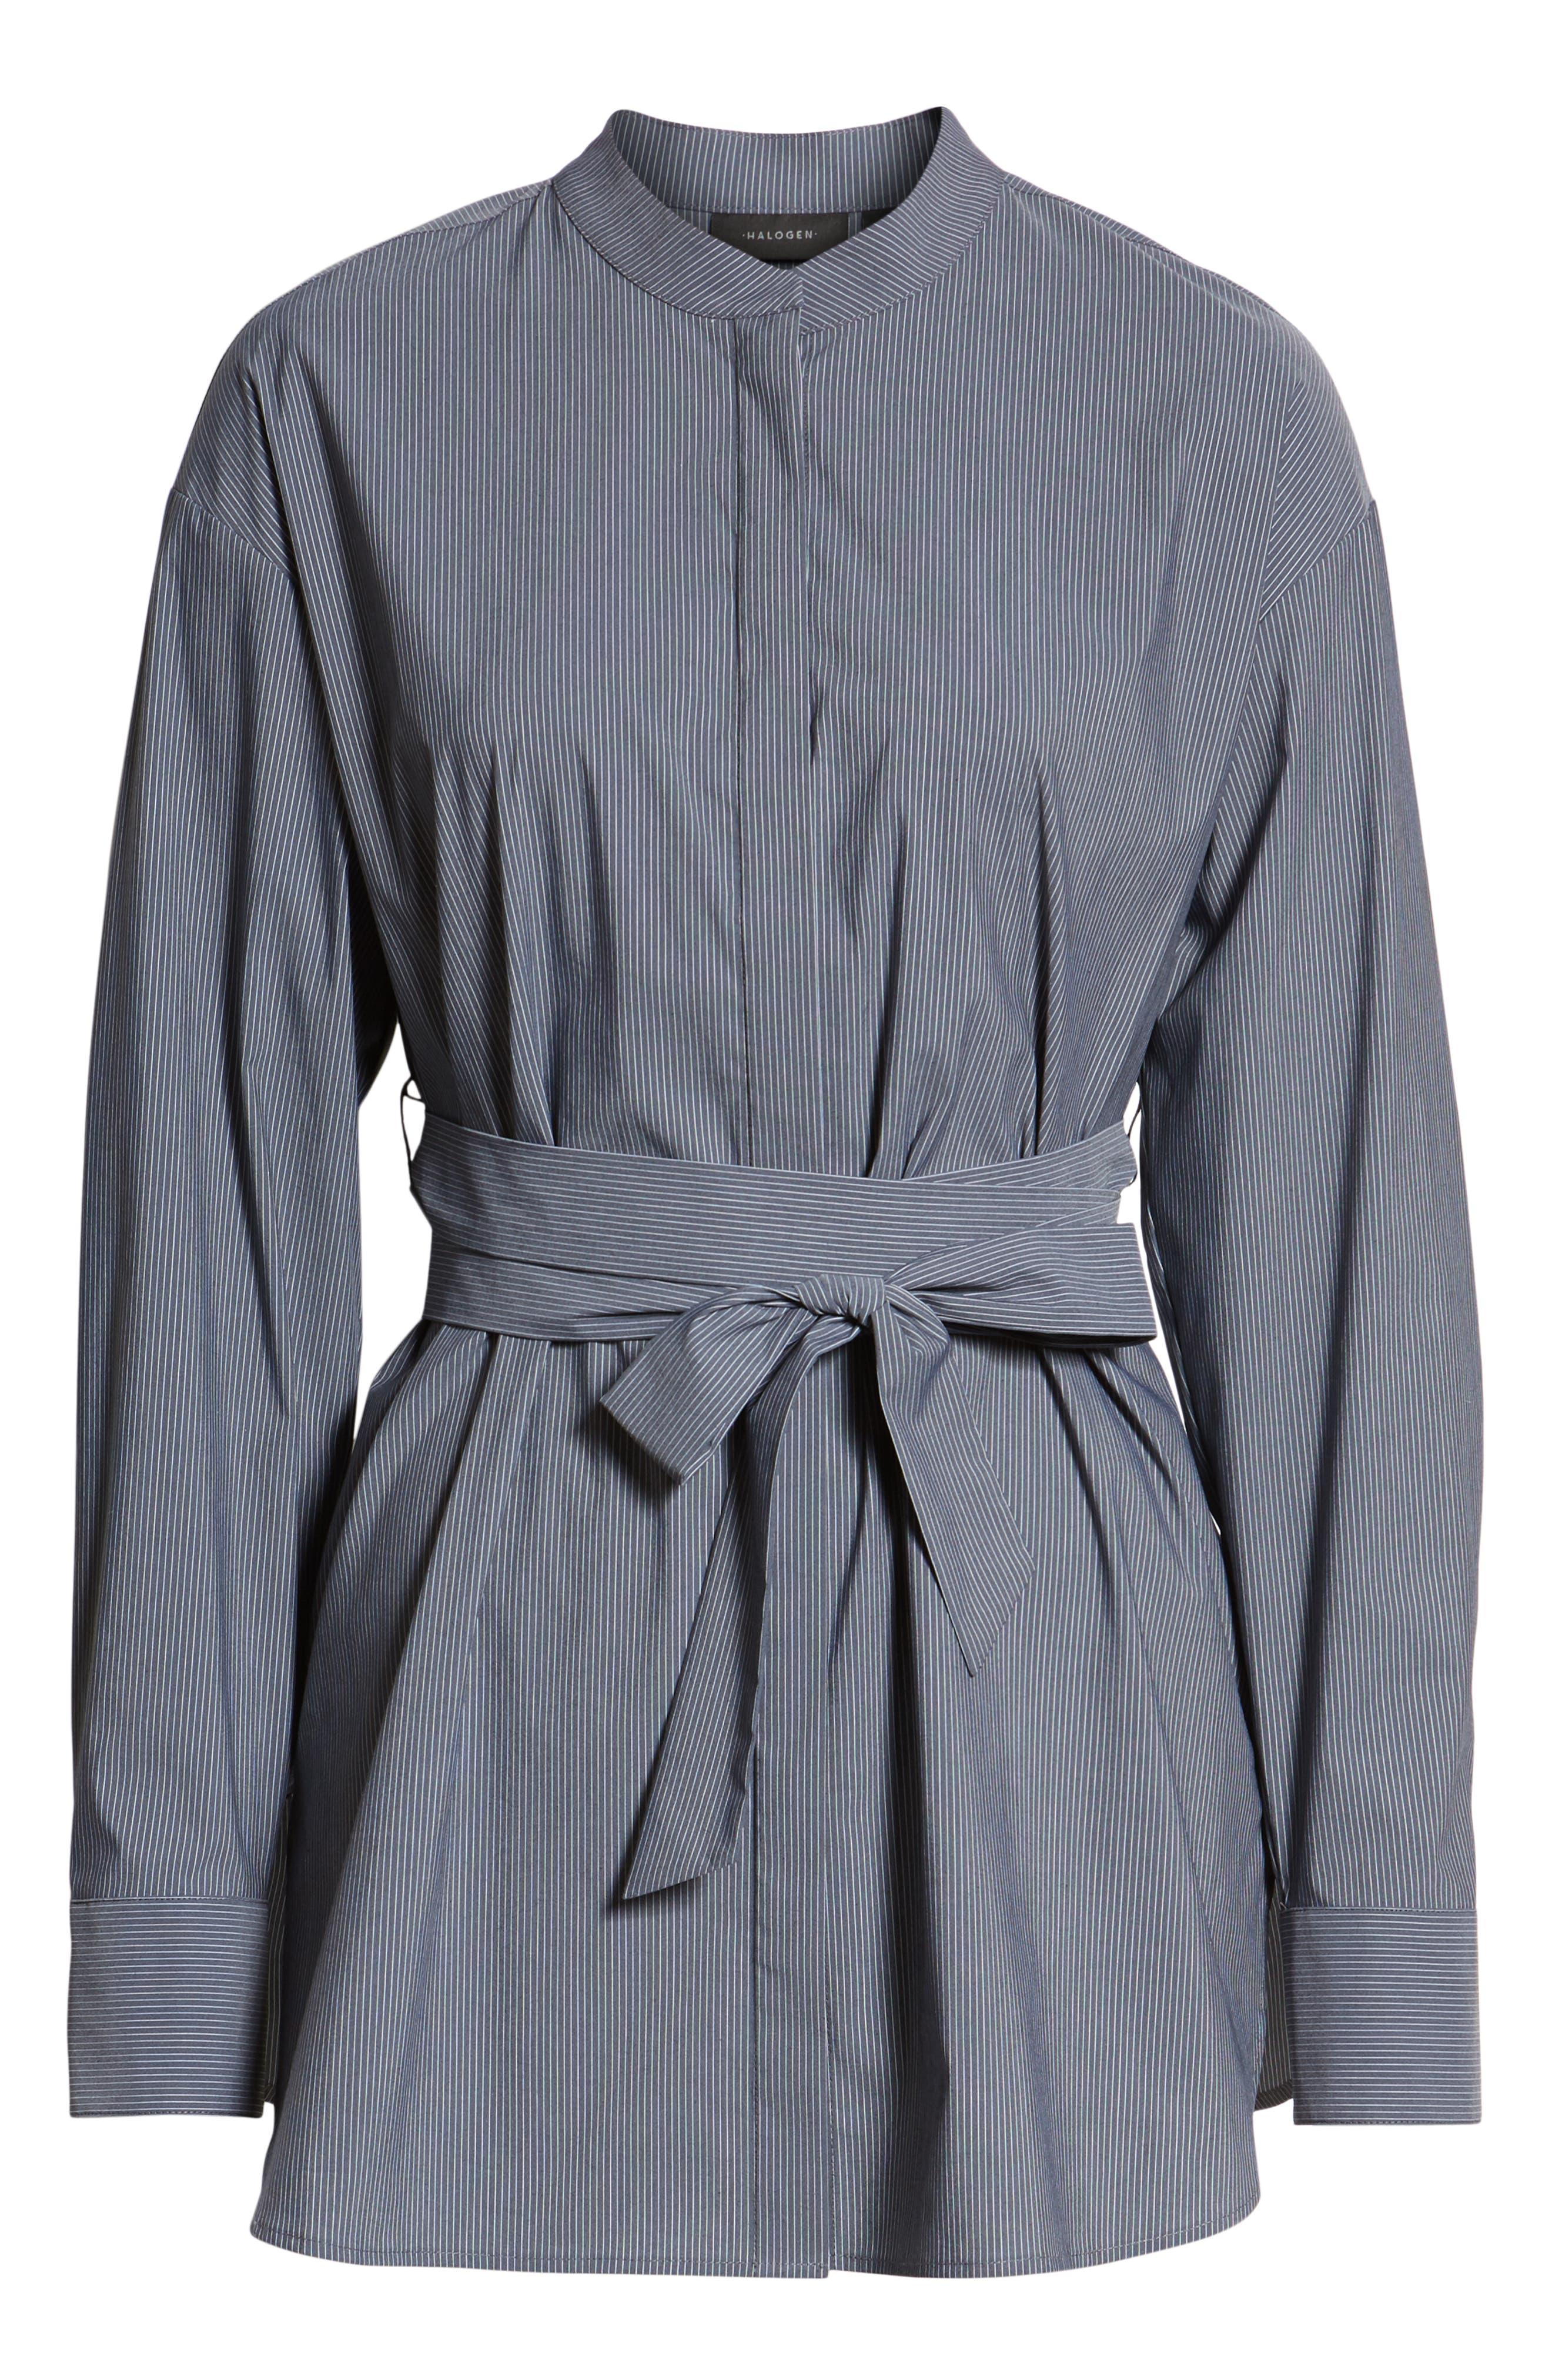 Belted Poplin Shirt,                             Alternate thumbnail 6, color,                             001